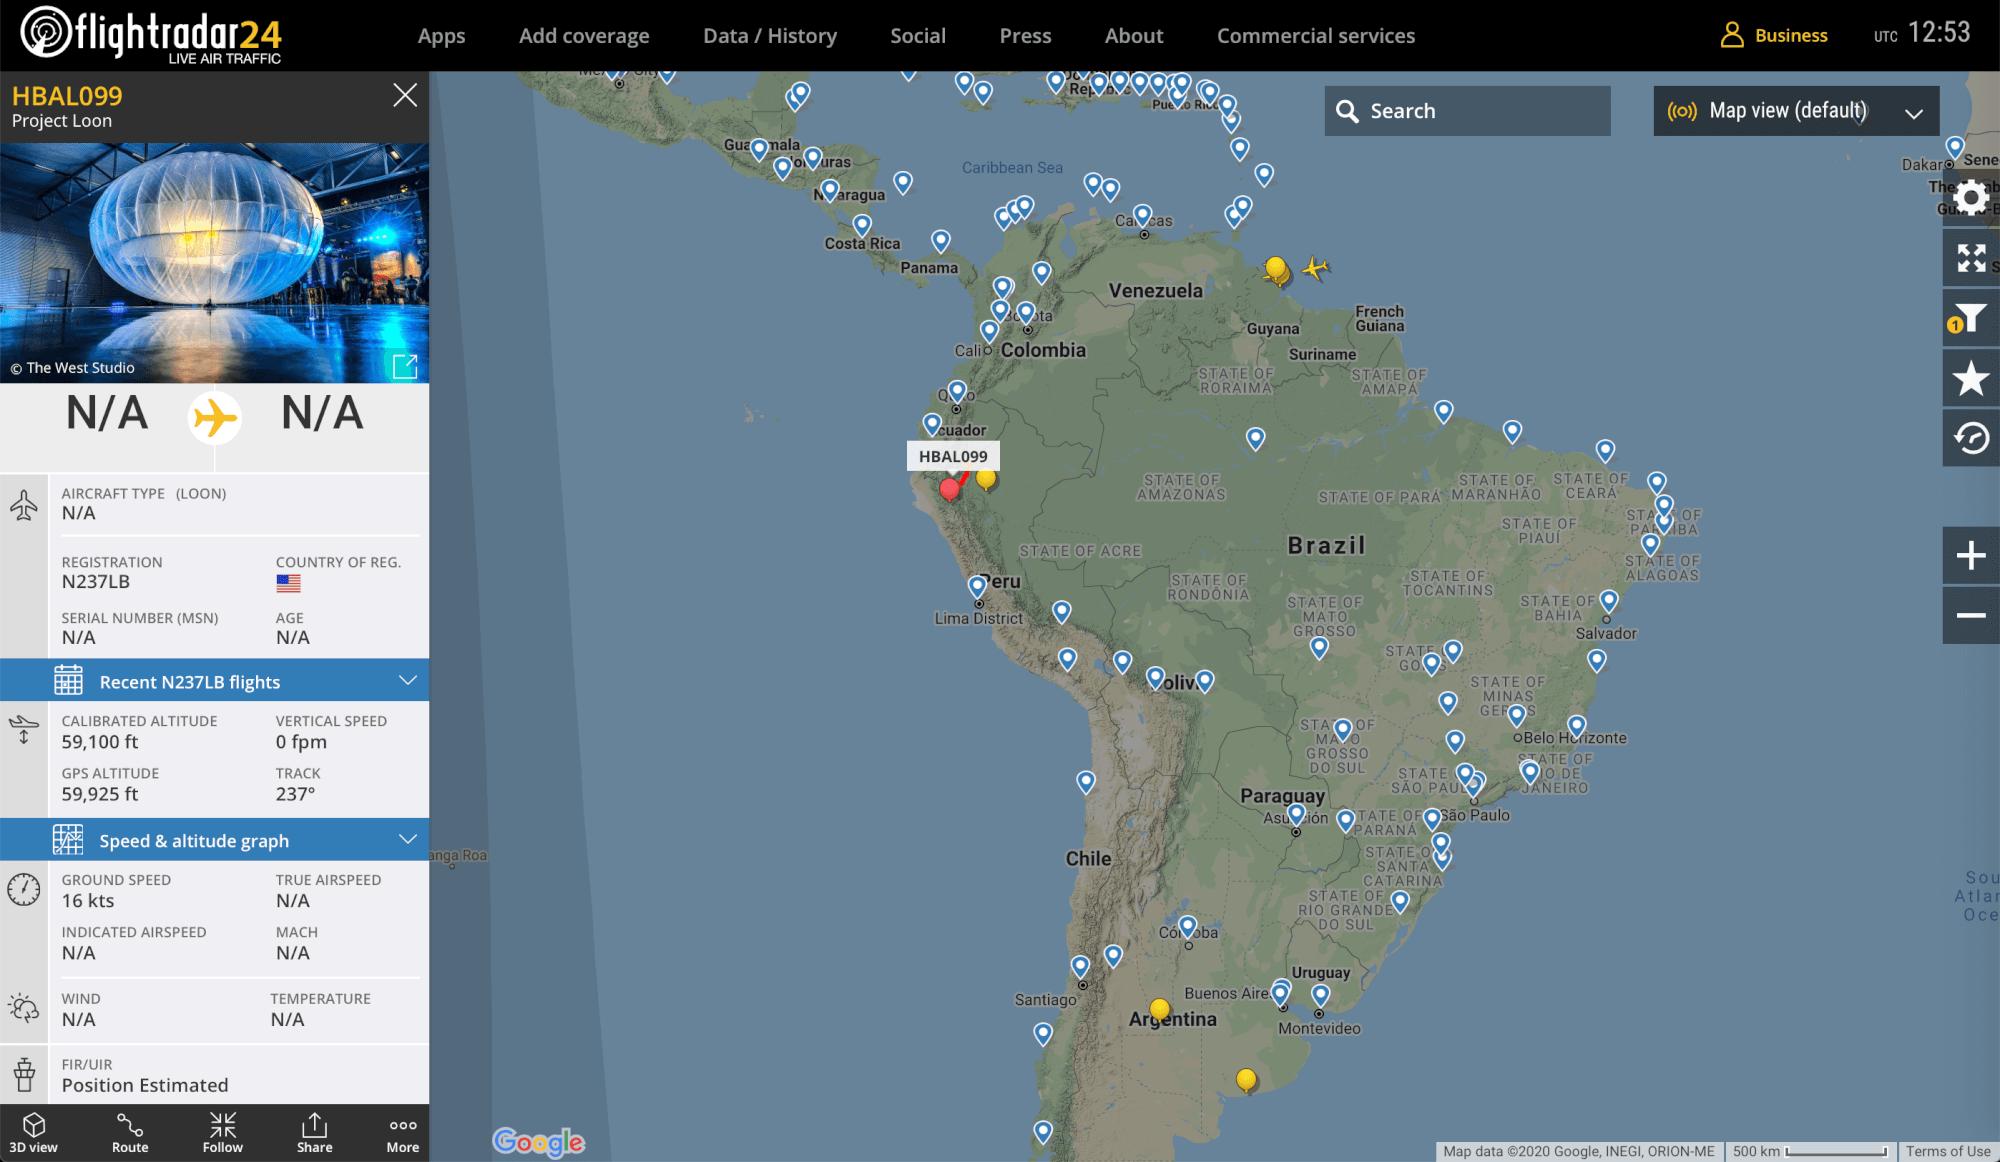 Loon flightradar24